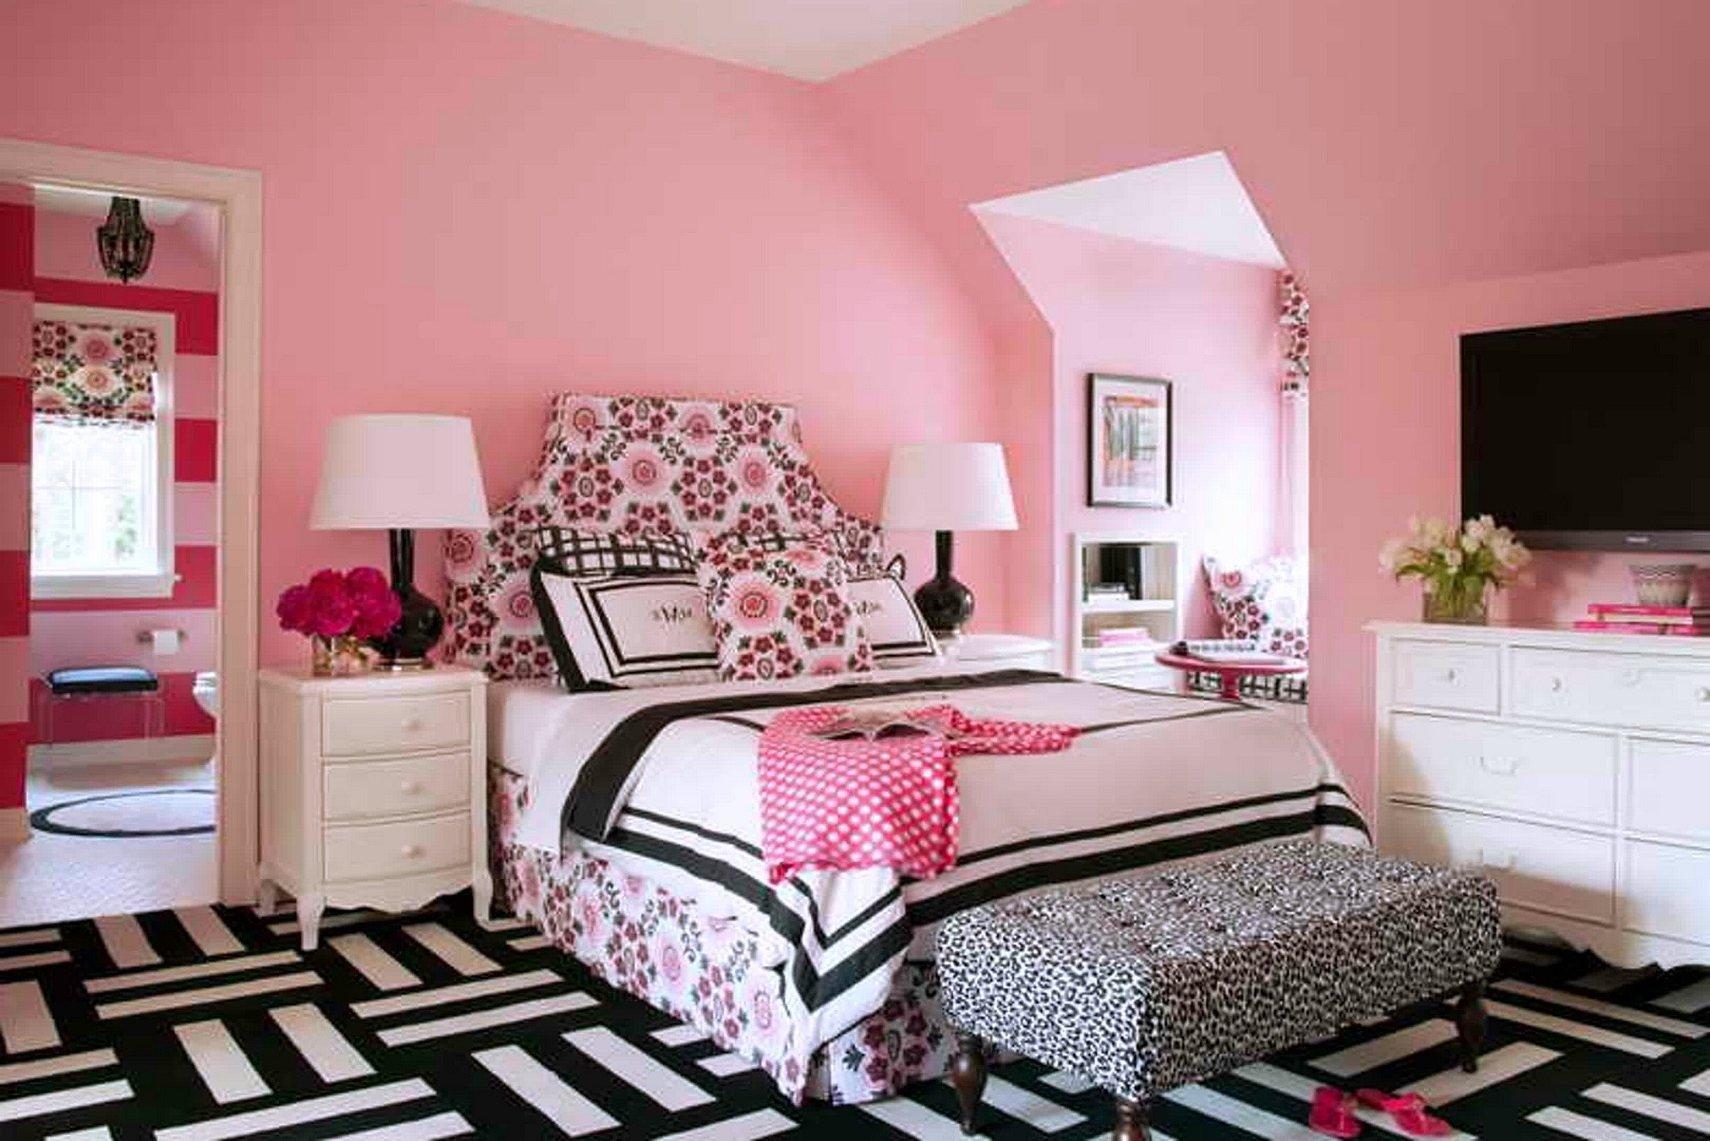 10 Fashionable Cute Bedroom Ideas For Teenage Girls cute bedroom ideas for teenage girl design womenmisbehavin 2020